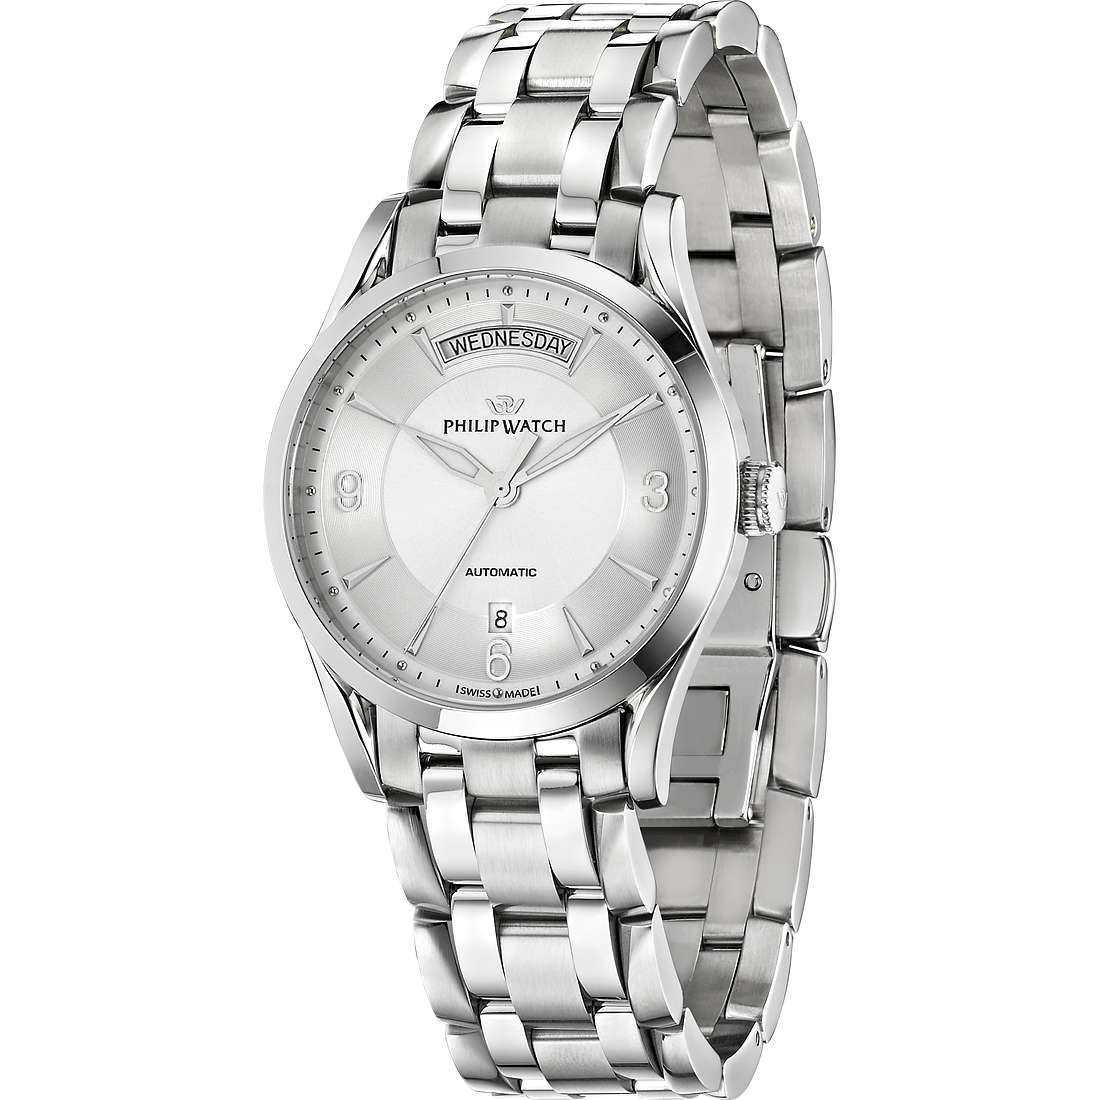 Orologio philip watch r8223180001